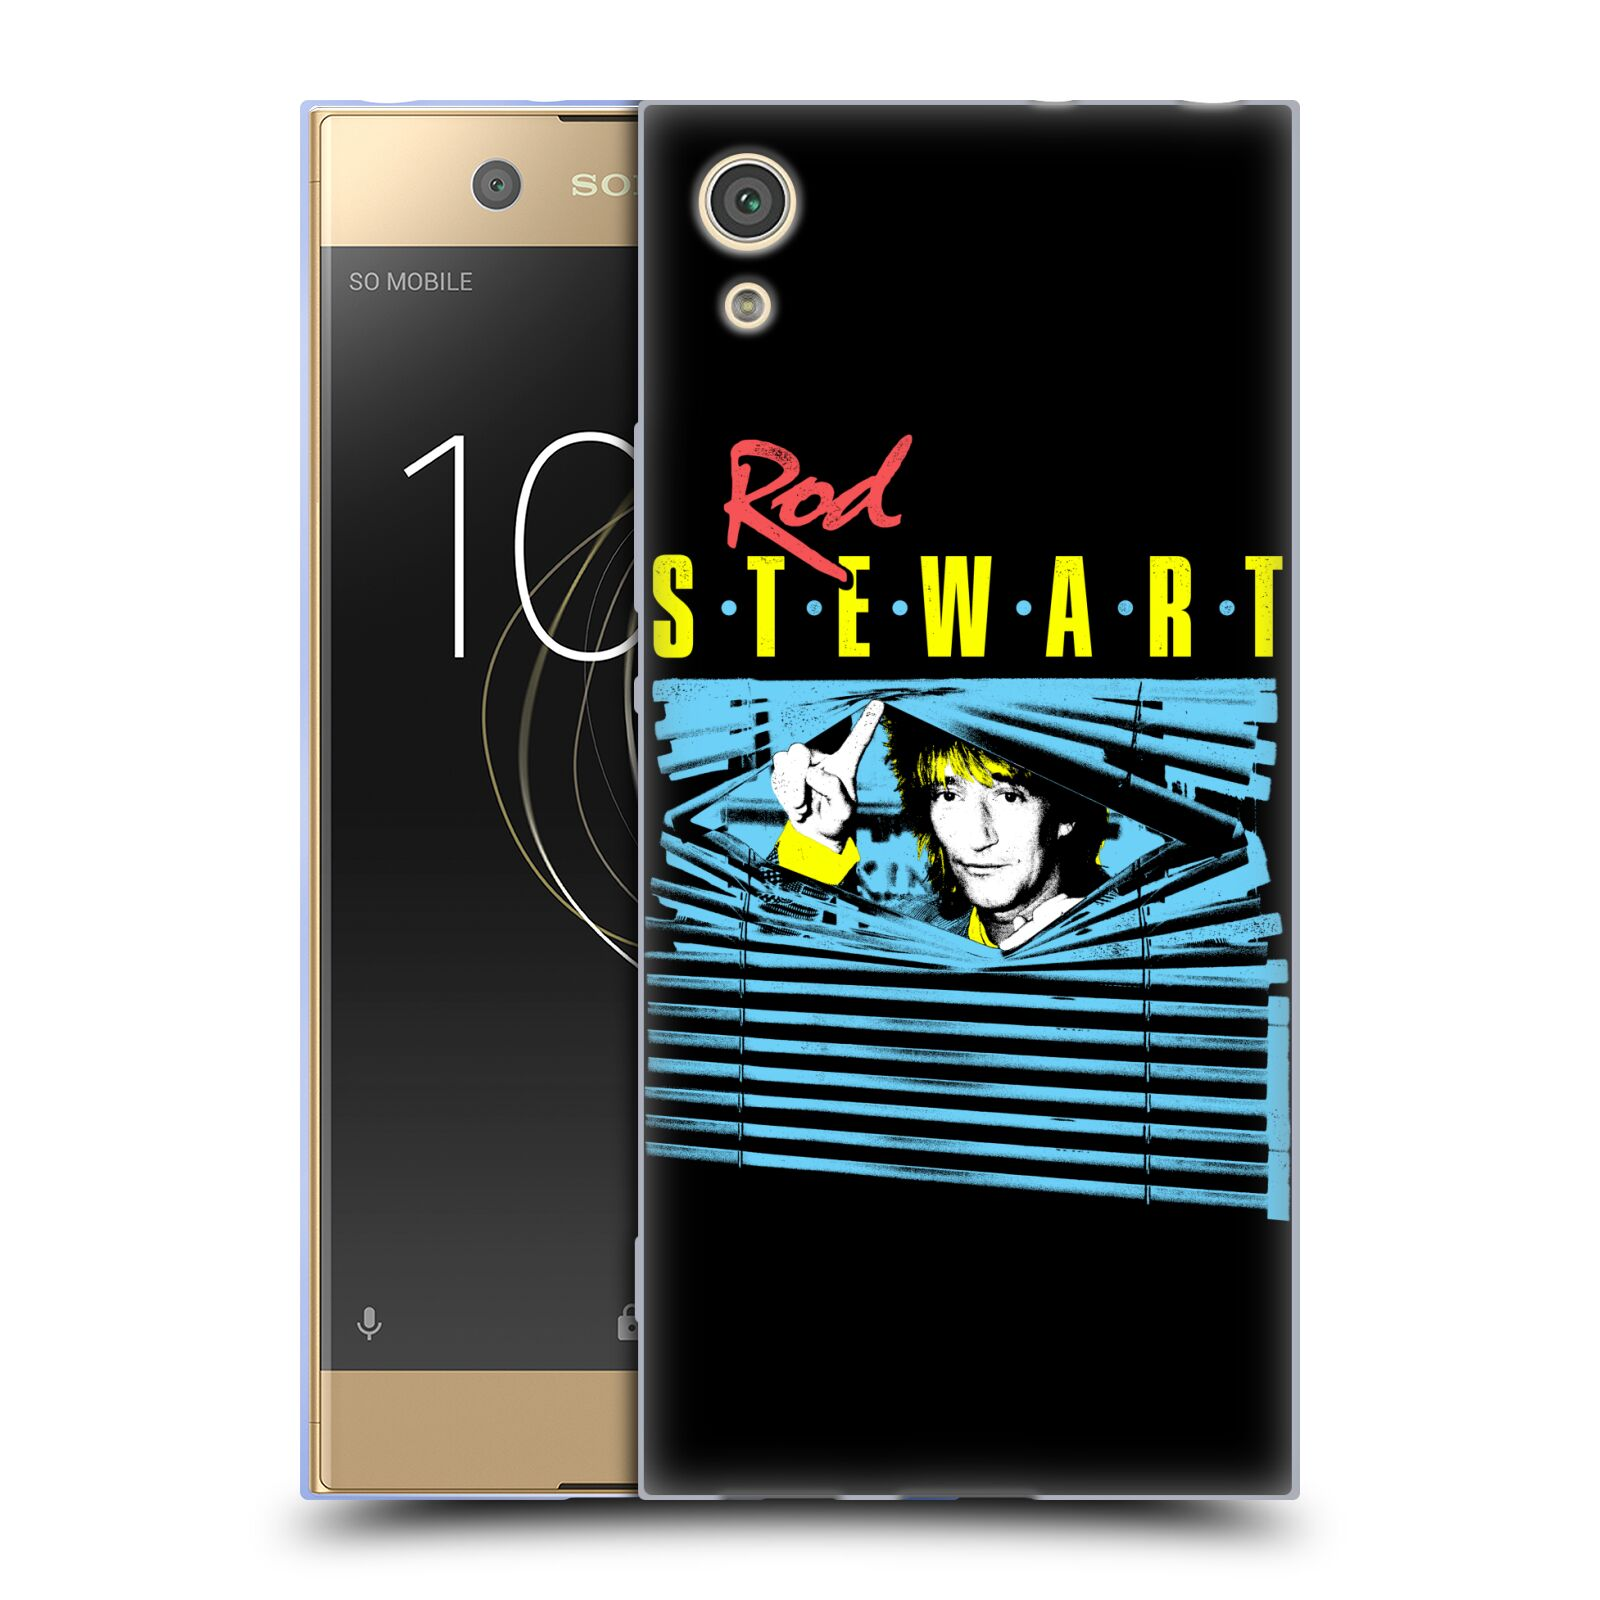 UFFICIALE-ROD-STEWART-ART-Soft-Gel-Custodia-per-Telefoni-Sony-1